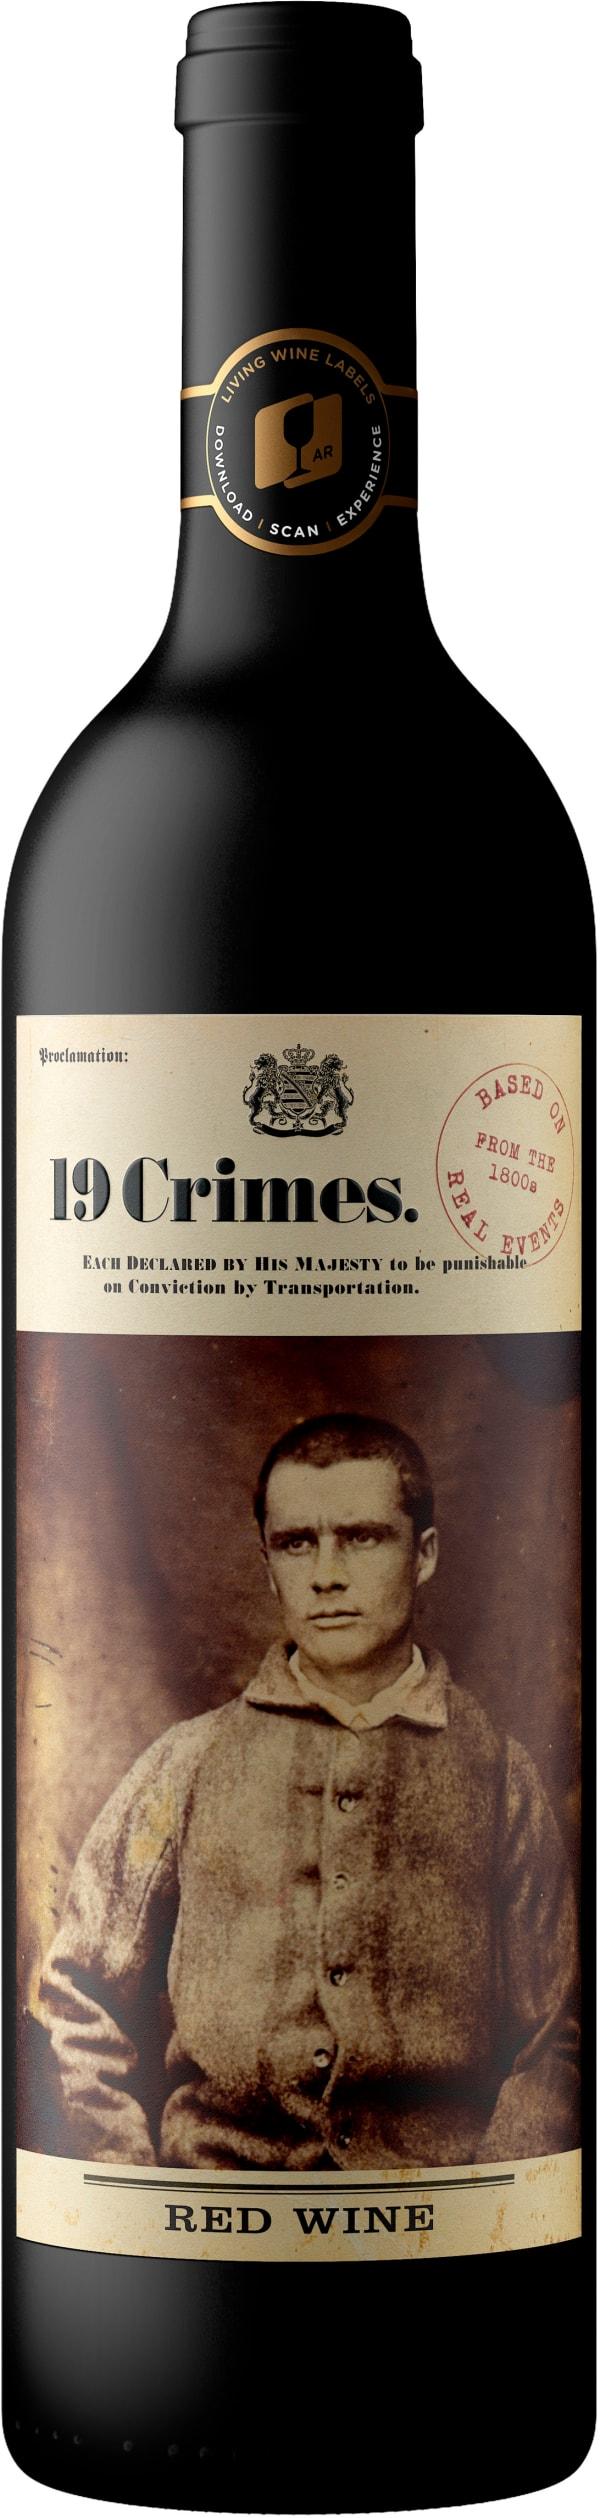 19 Crimes Red wine 2020